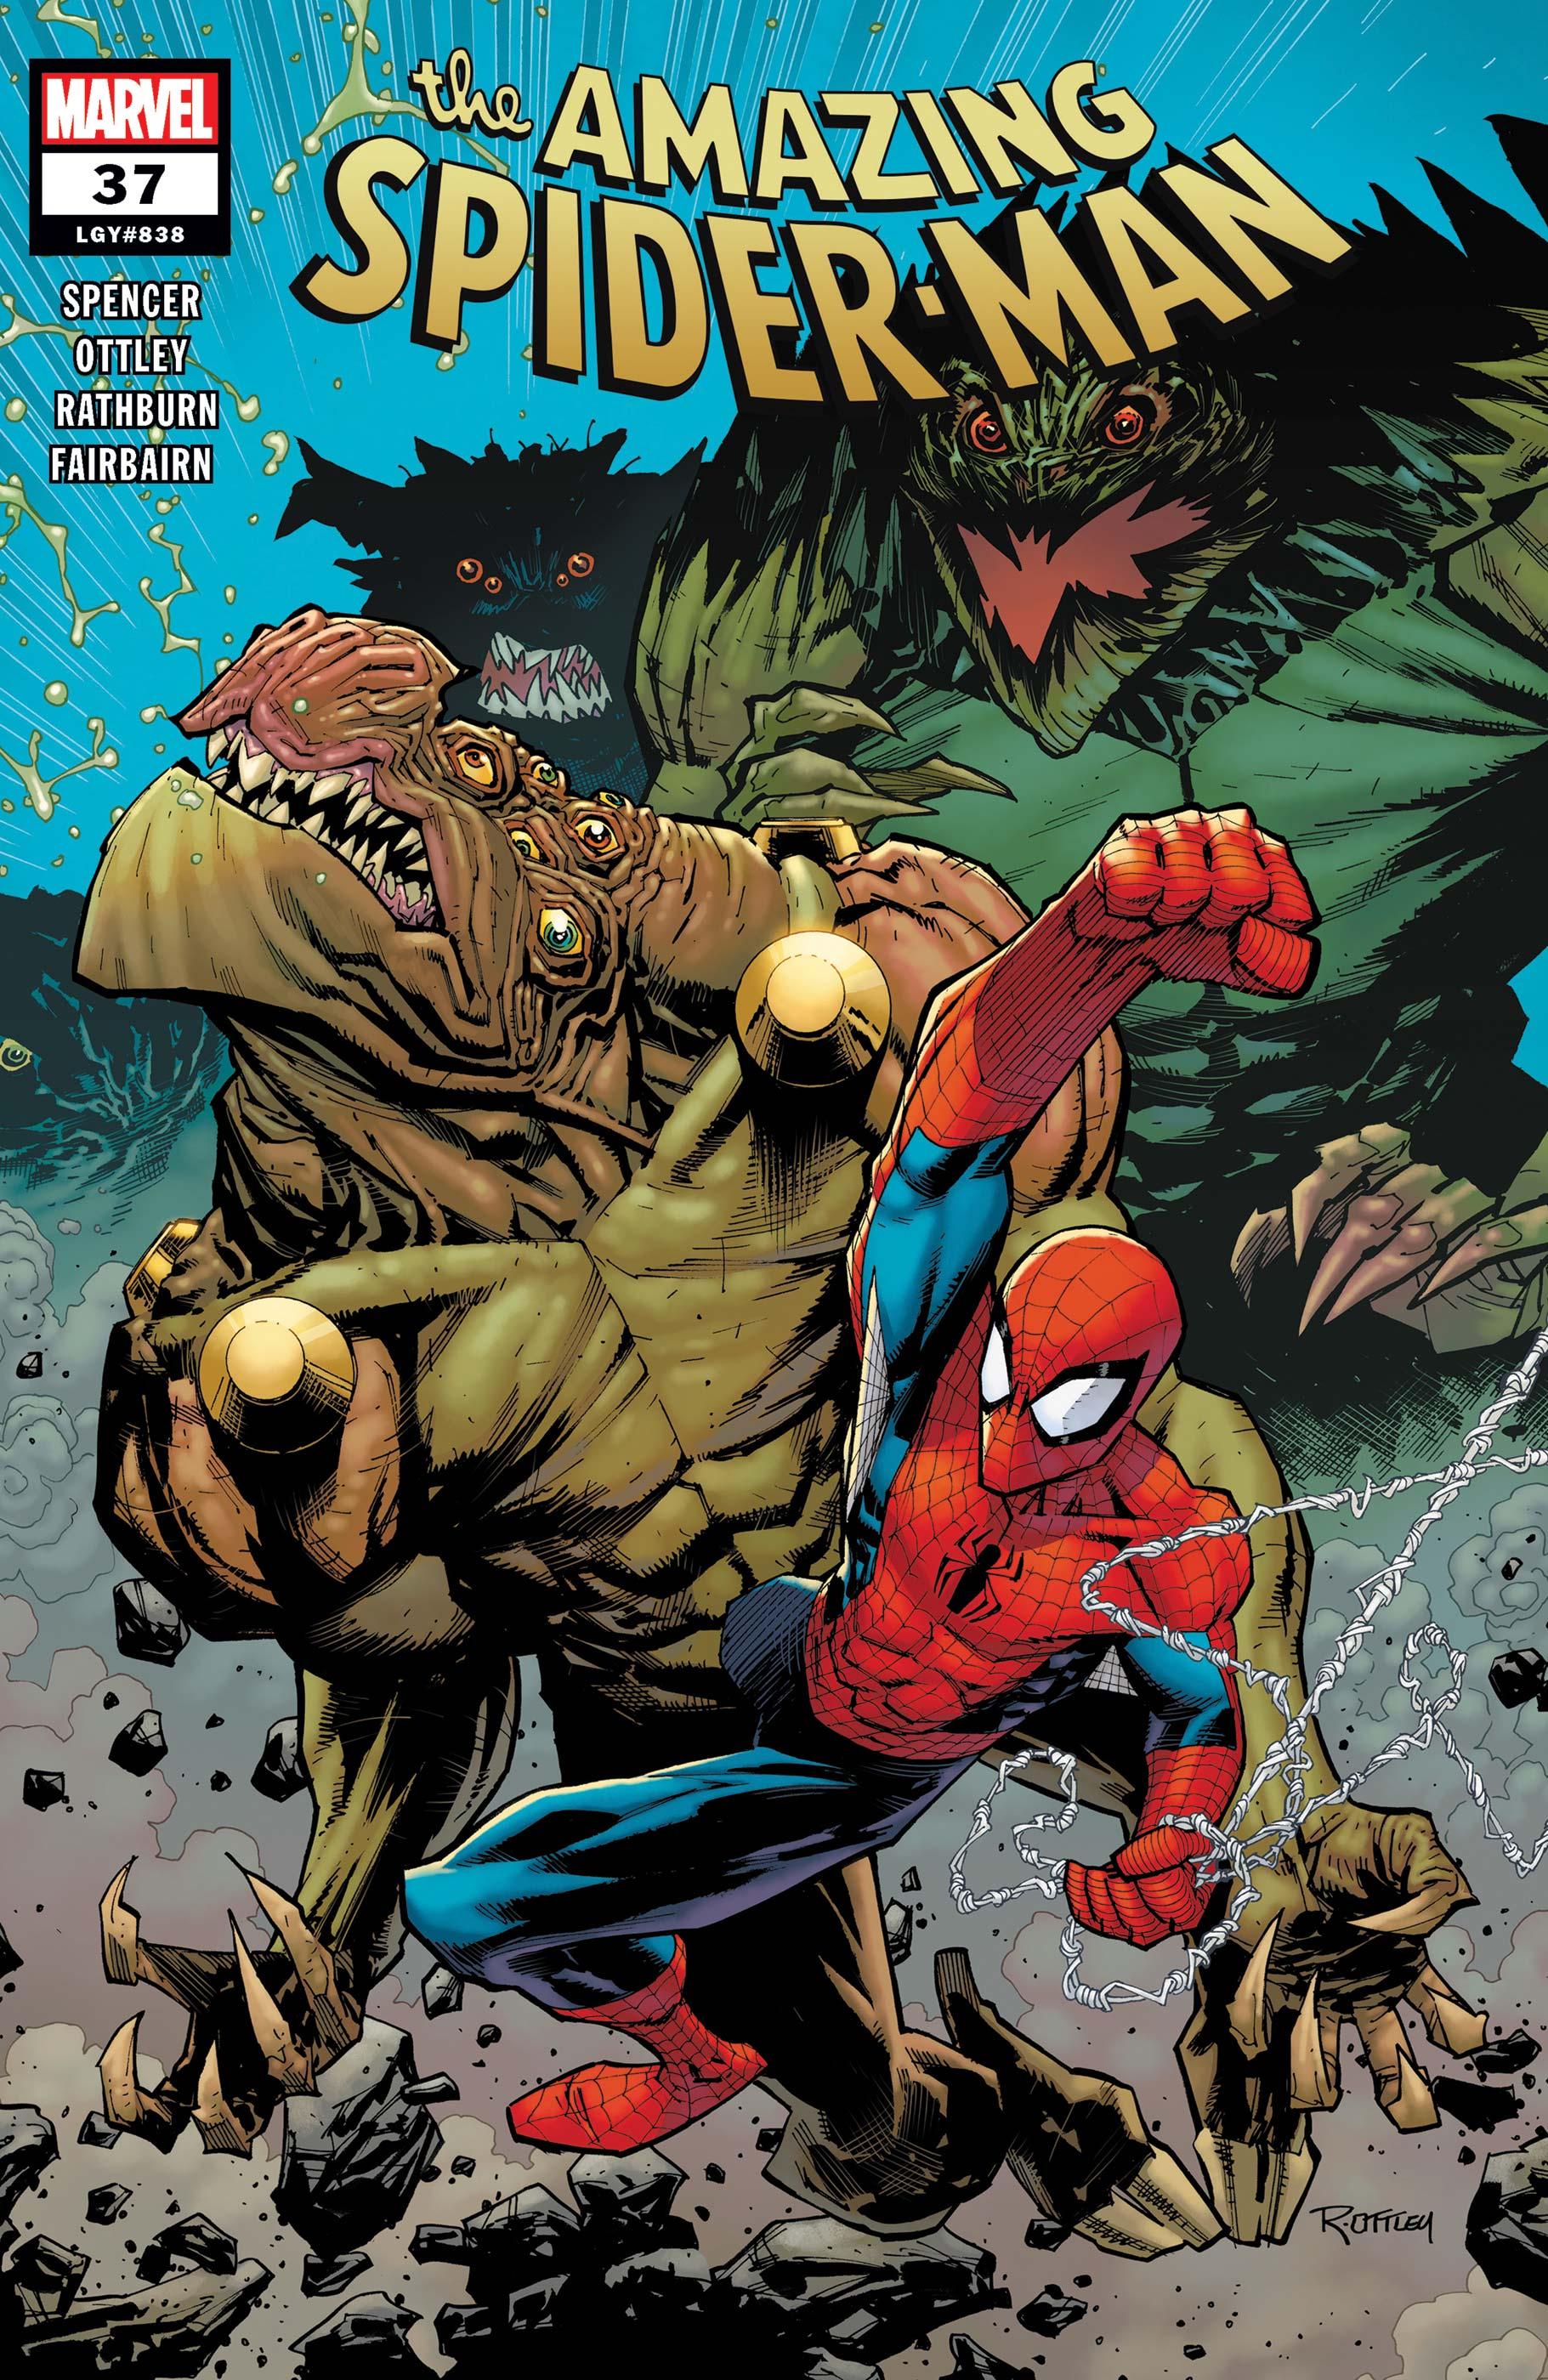 The Amazing Spider-Man (2018) #37